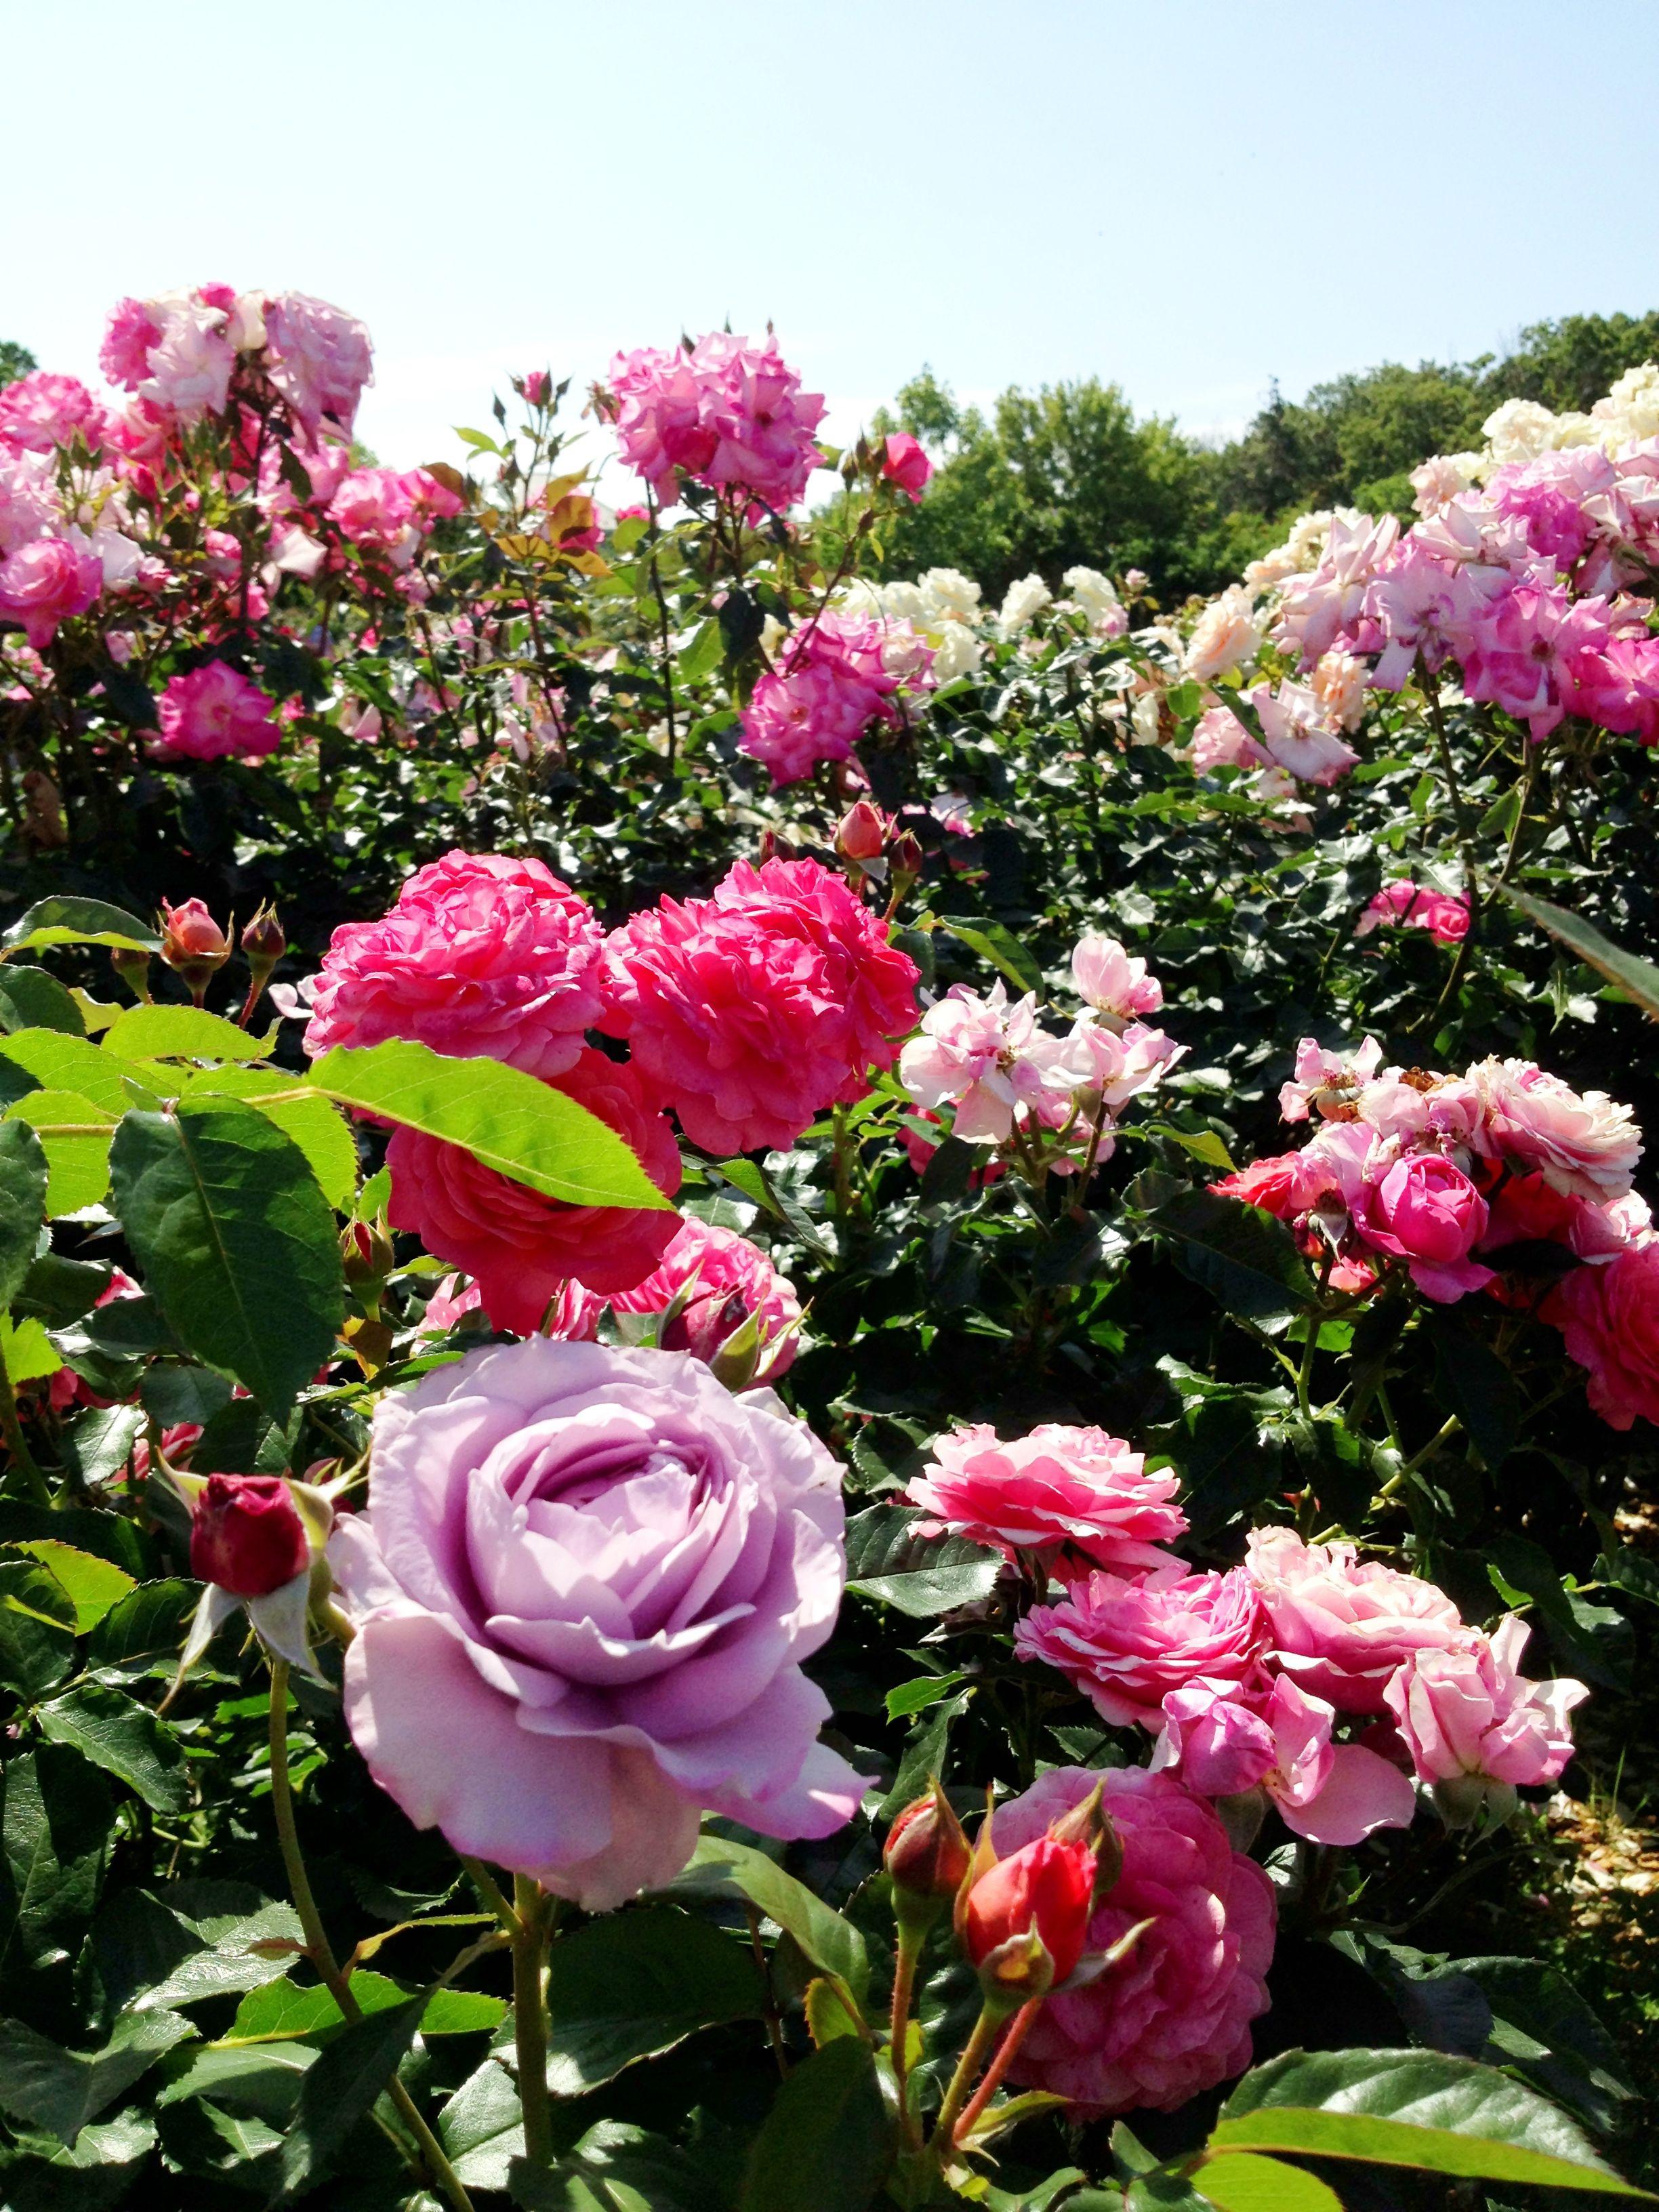 2013,spring KEISEI rose garden chiba,JAPAN 京成ローズガーデン